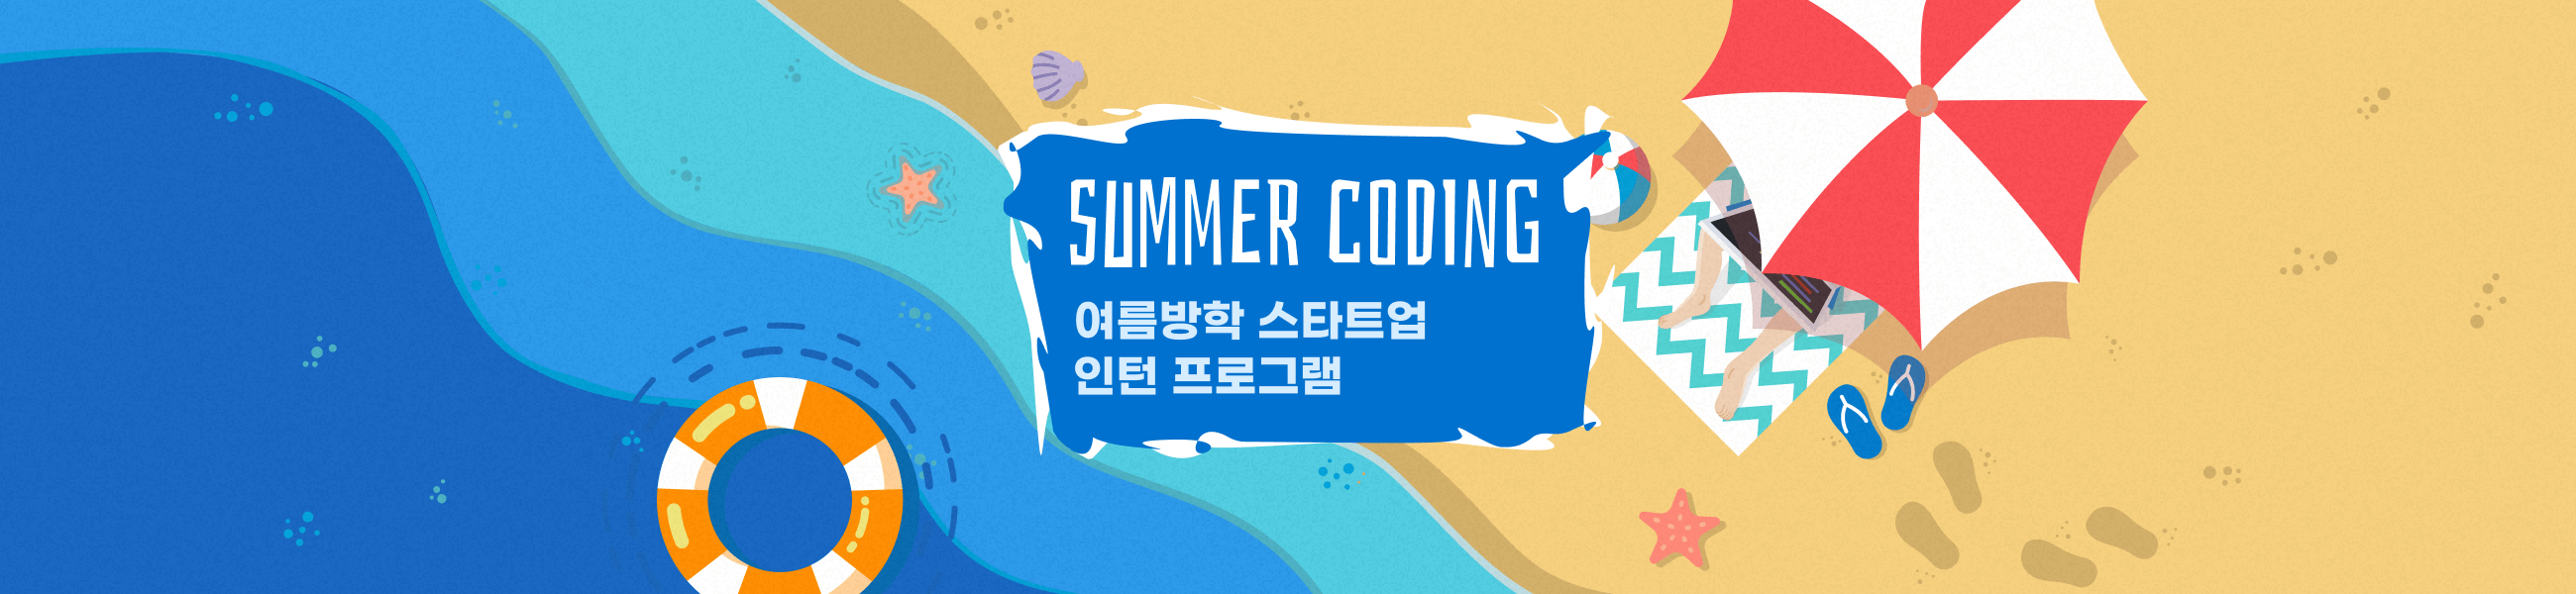 2020 Summer Coding - 여름방학 스타트업 인턴 프로그램의 이미지